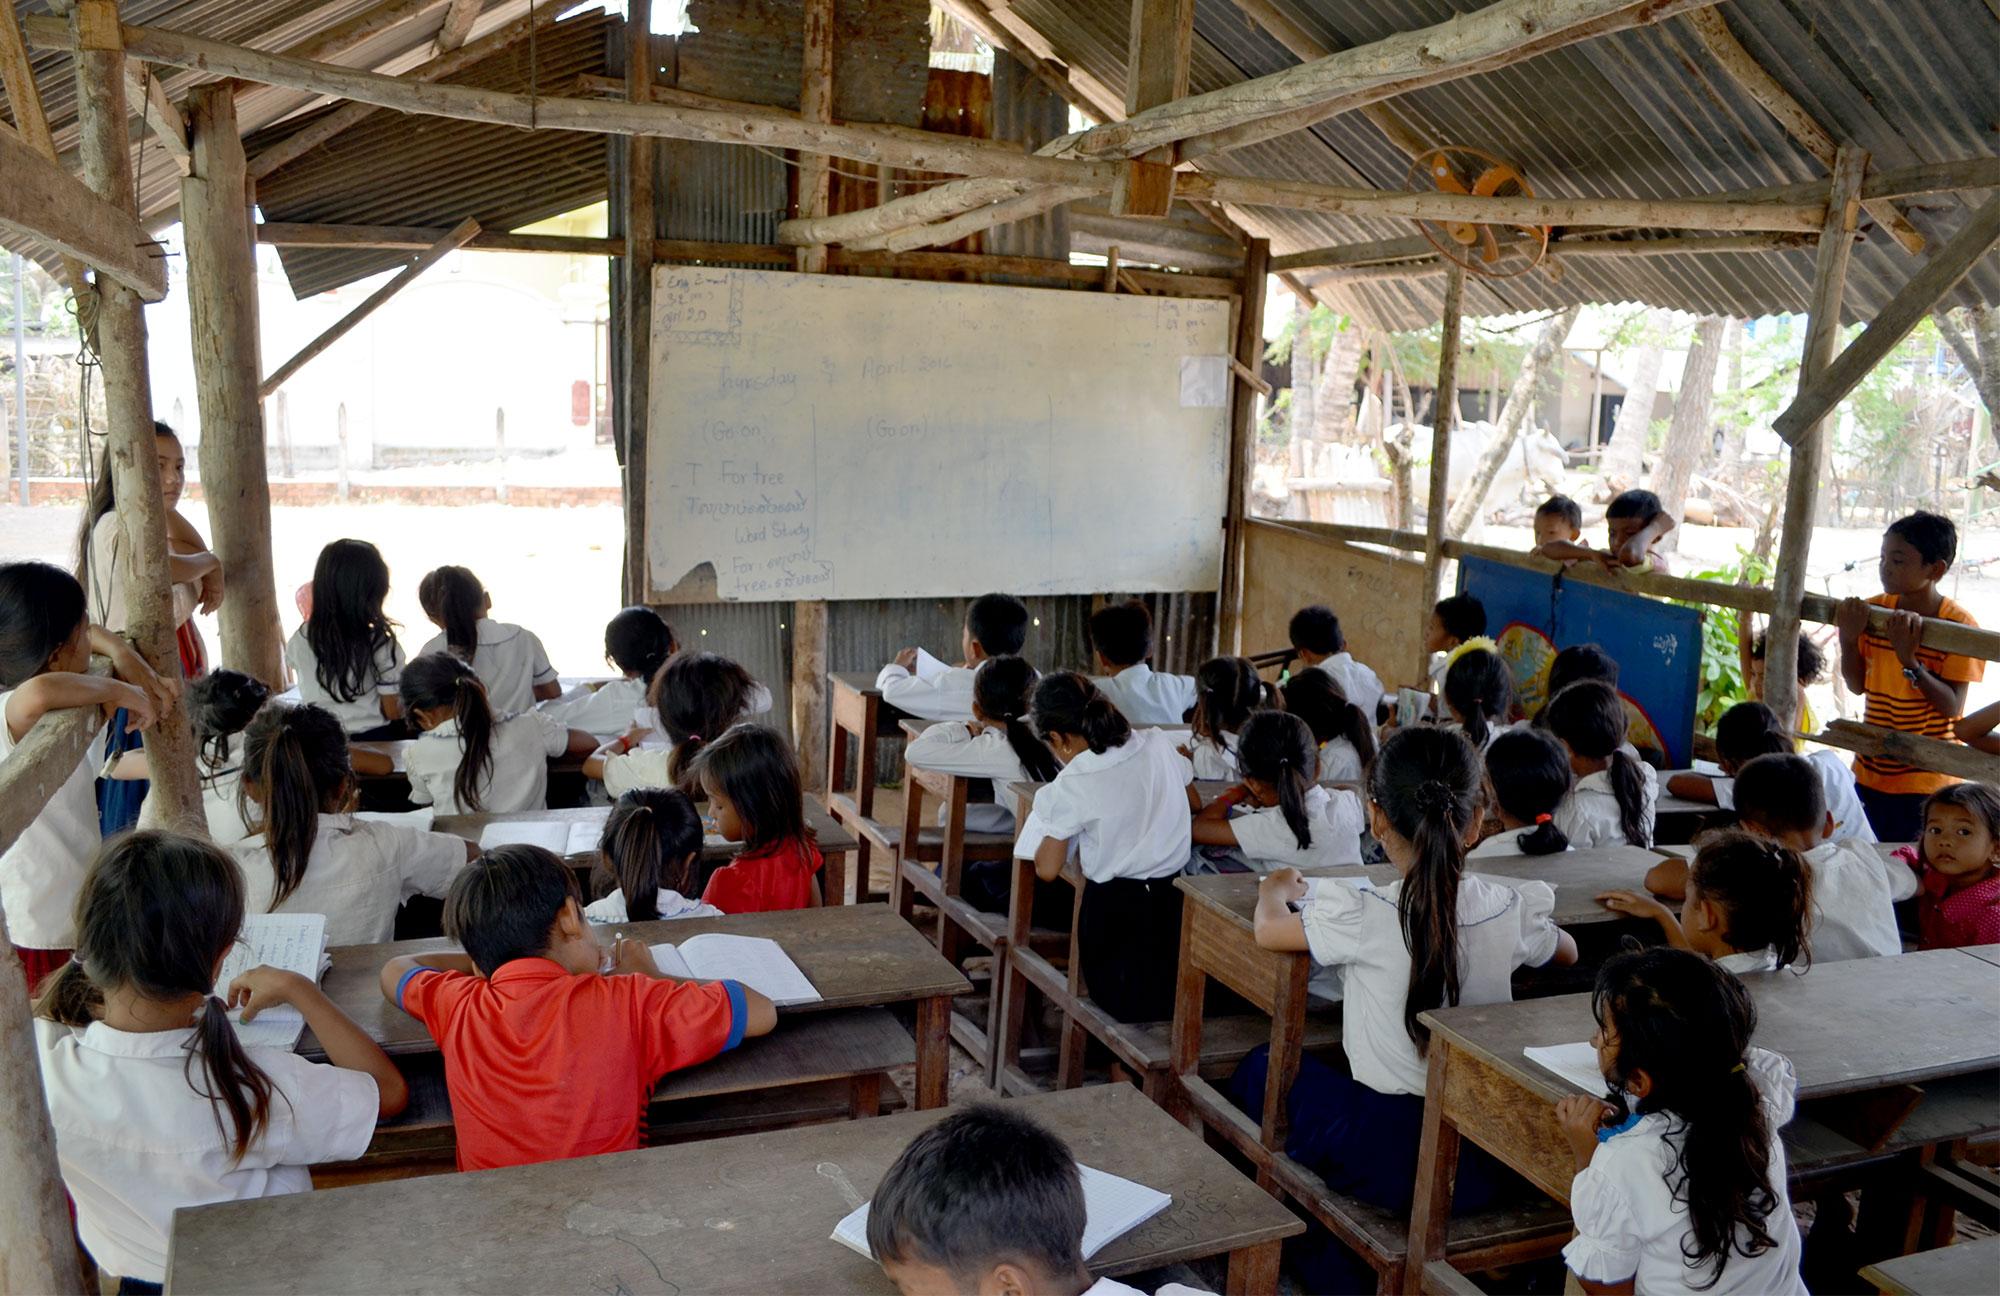 Dank Socialbnb kann Mr. Thy den Kindern heute kostenlosen Englischunterricht anbieten